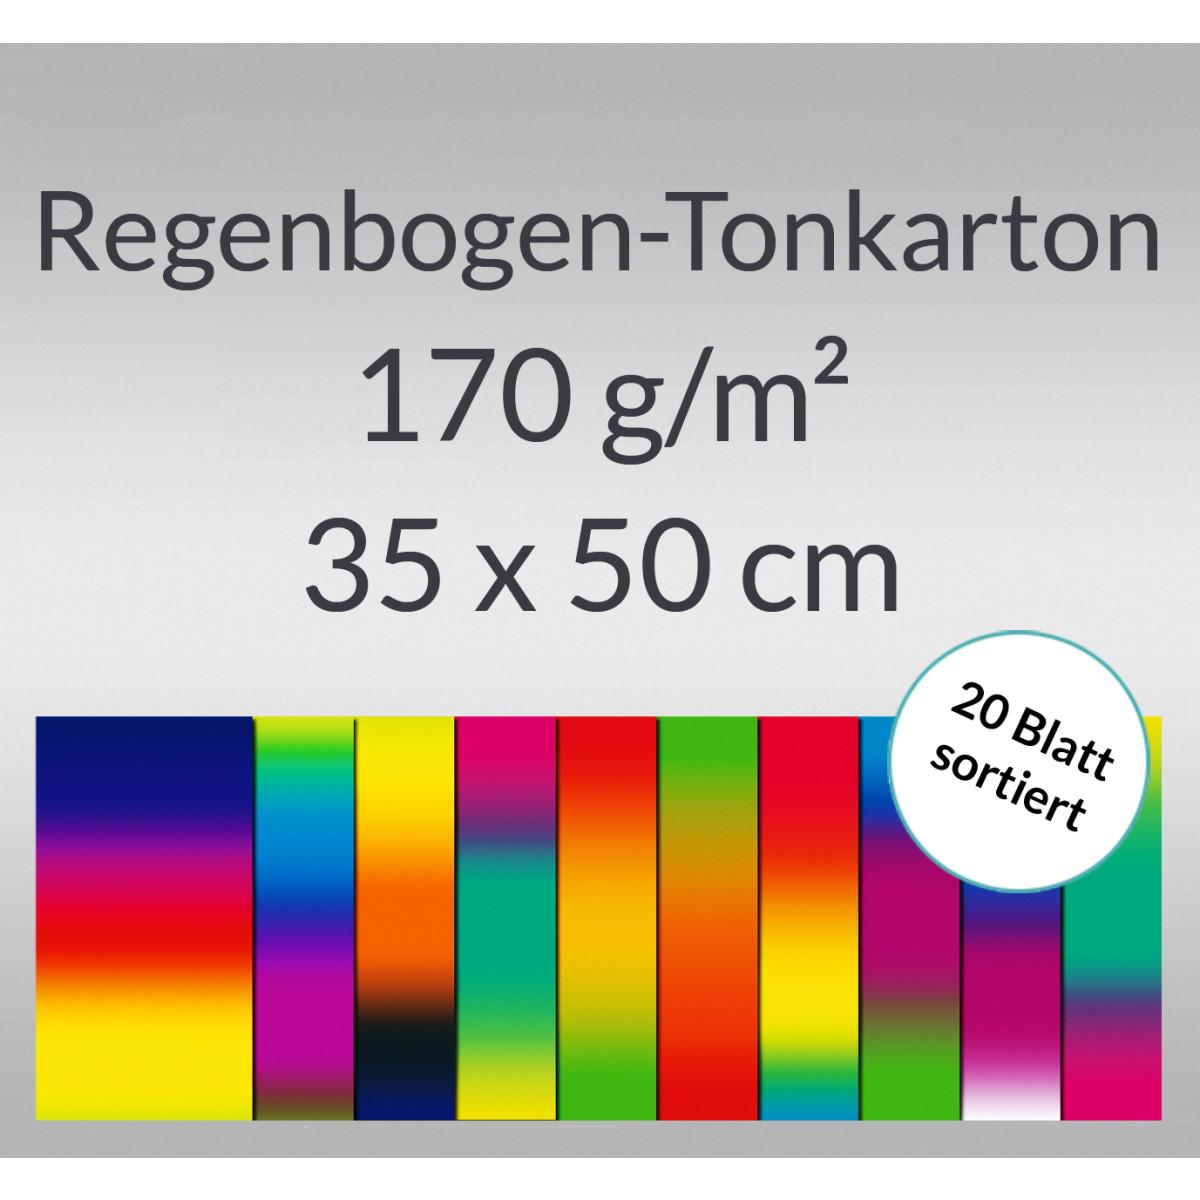 Regenbogen-Tonkarton 170 g/qm 35 x 50 cm - 20 Blatt sortiert